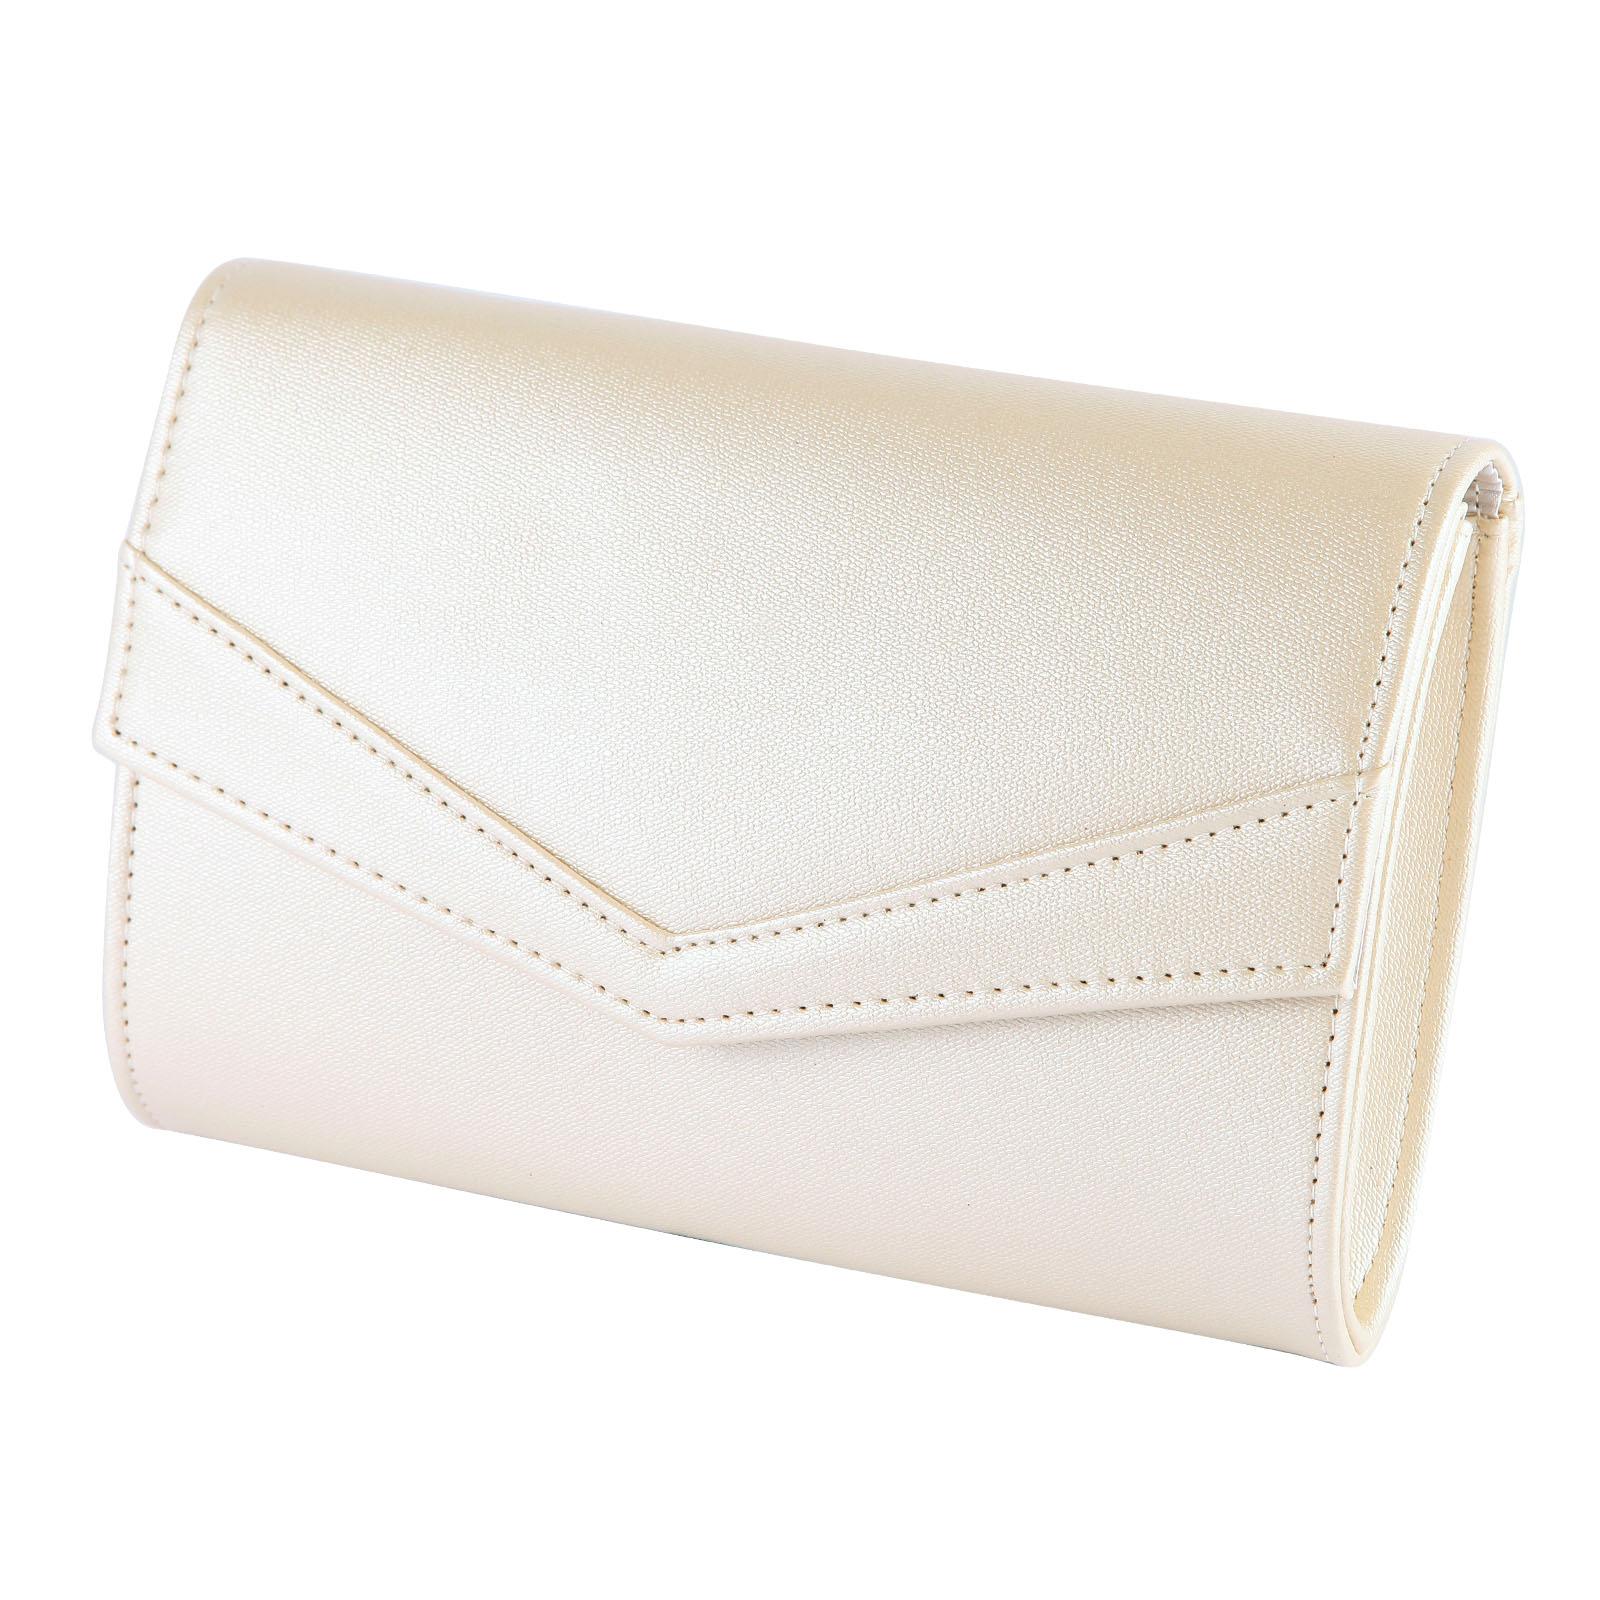 COLOURED zip WALLET clutch PURSELITCHI grain FAUX leatherUK *NEXT day*